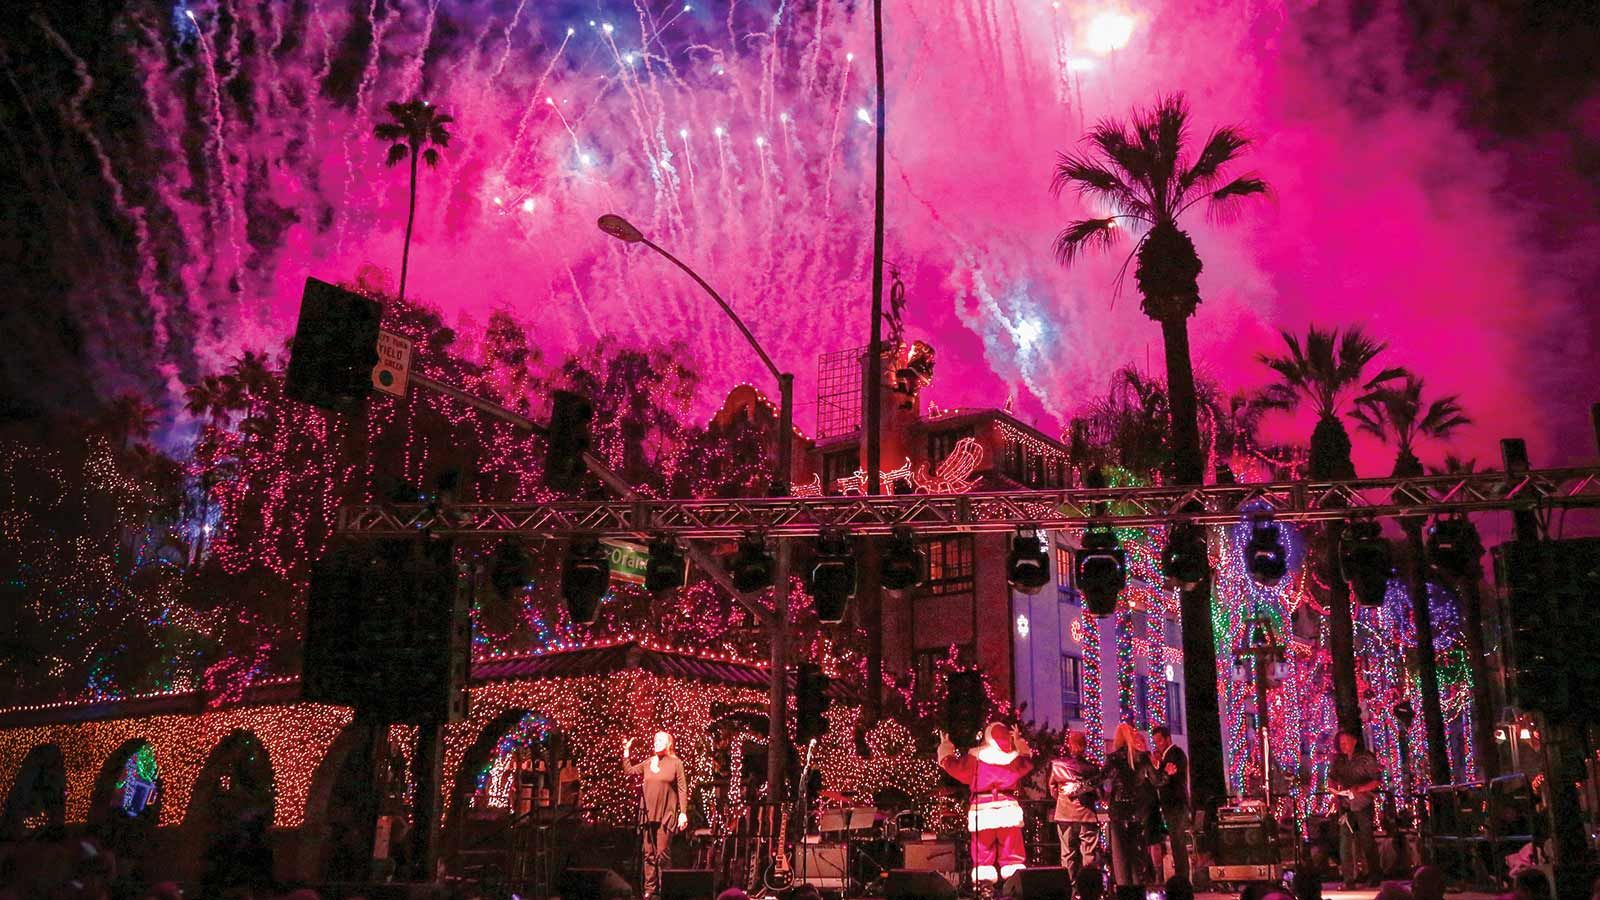 Festival of Lights Riverside CA Mission Inn Hotel and